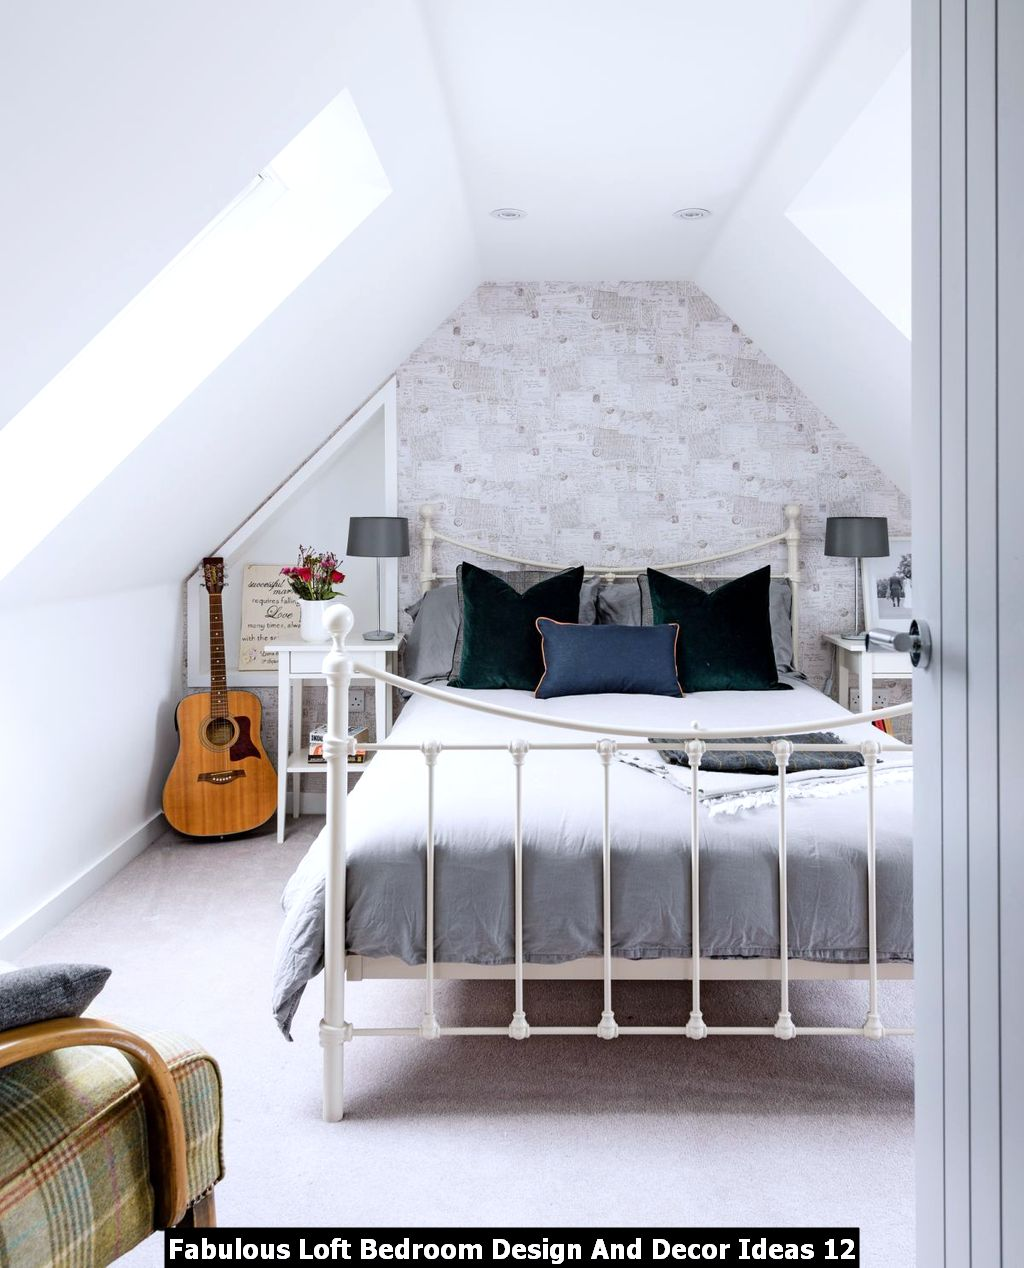 Fabulous Loft Bedroom Design And Decor Ideas 12